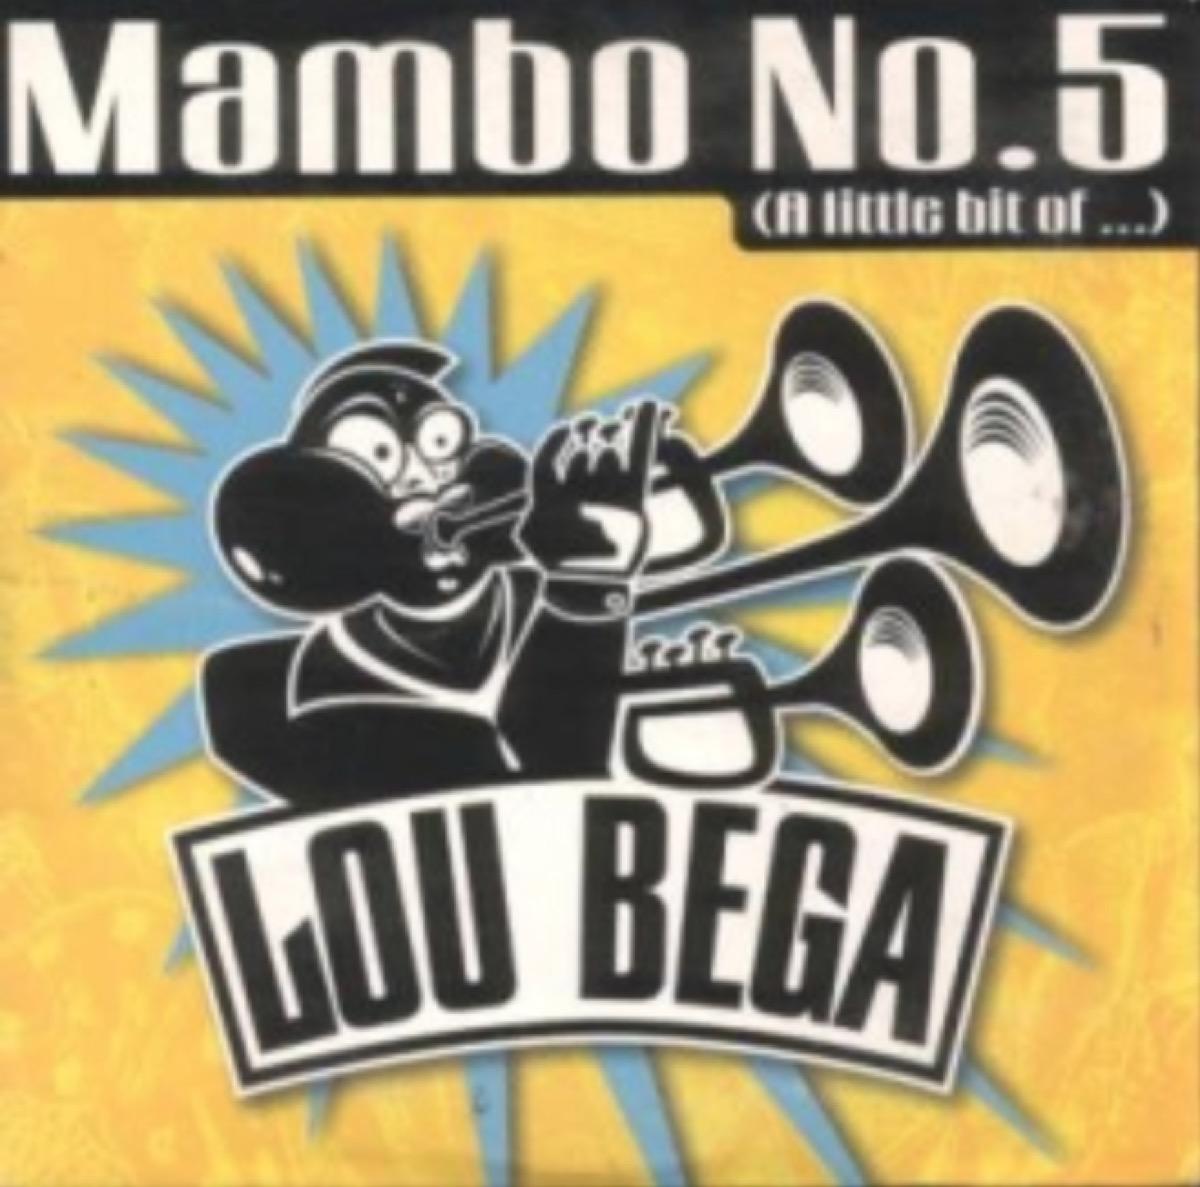 Lou Bega Mambo No. 5 1990s One-Hit Wonders